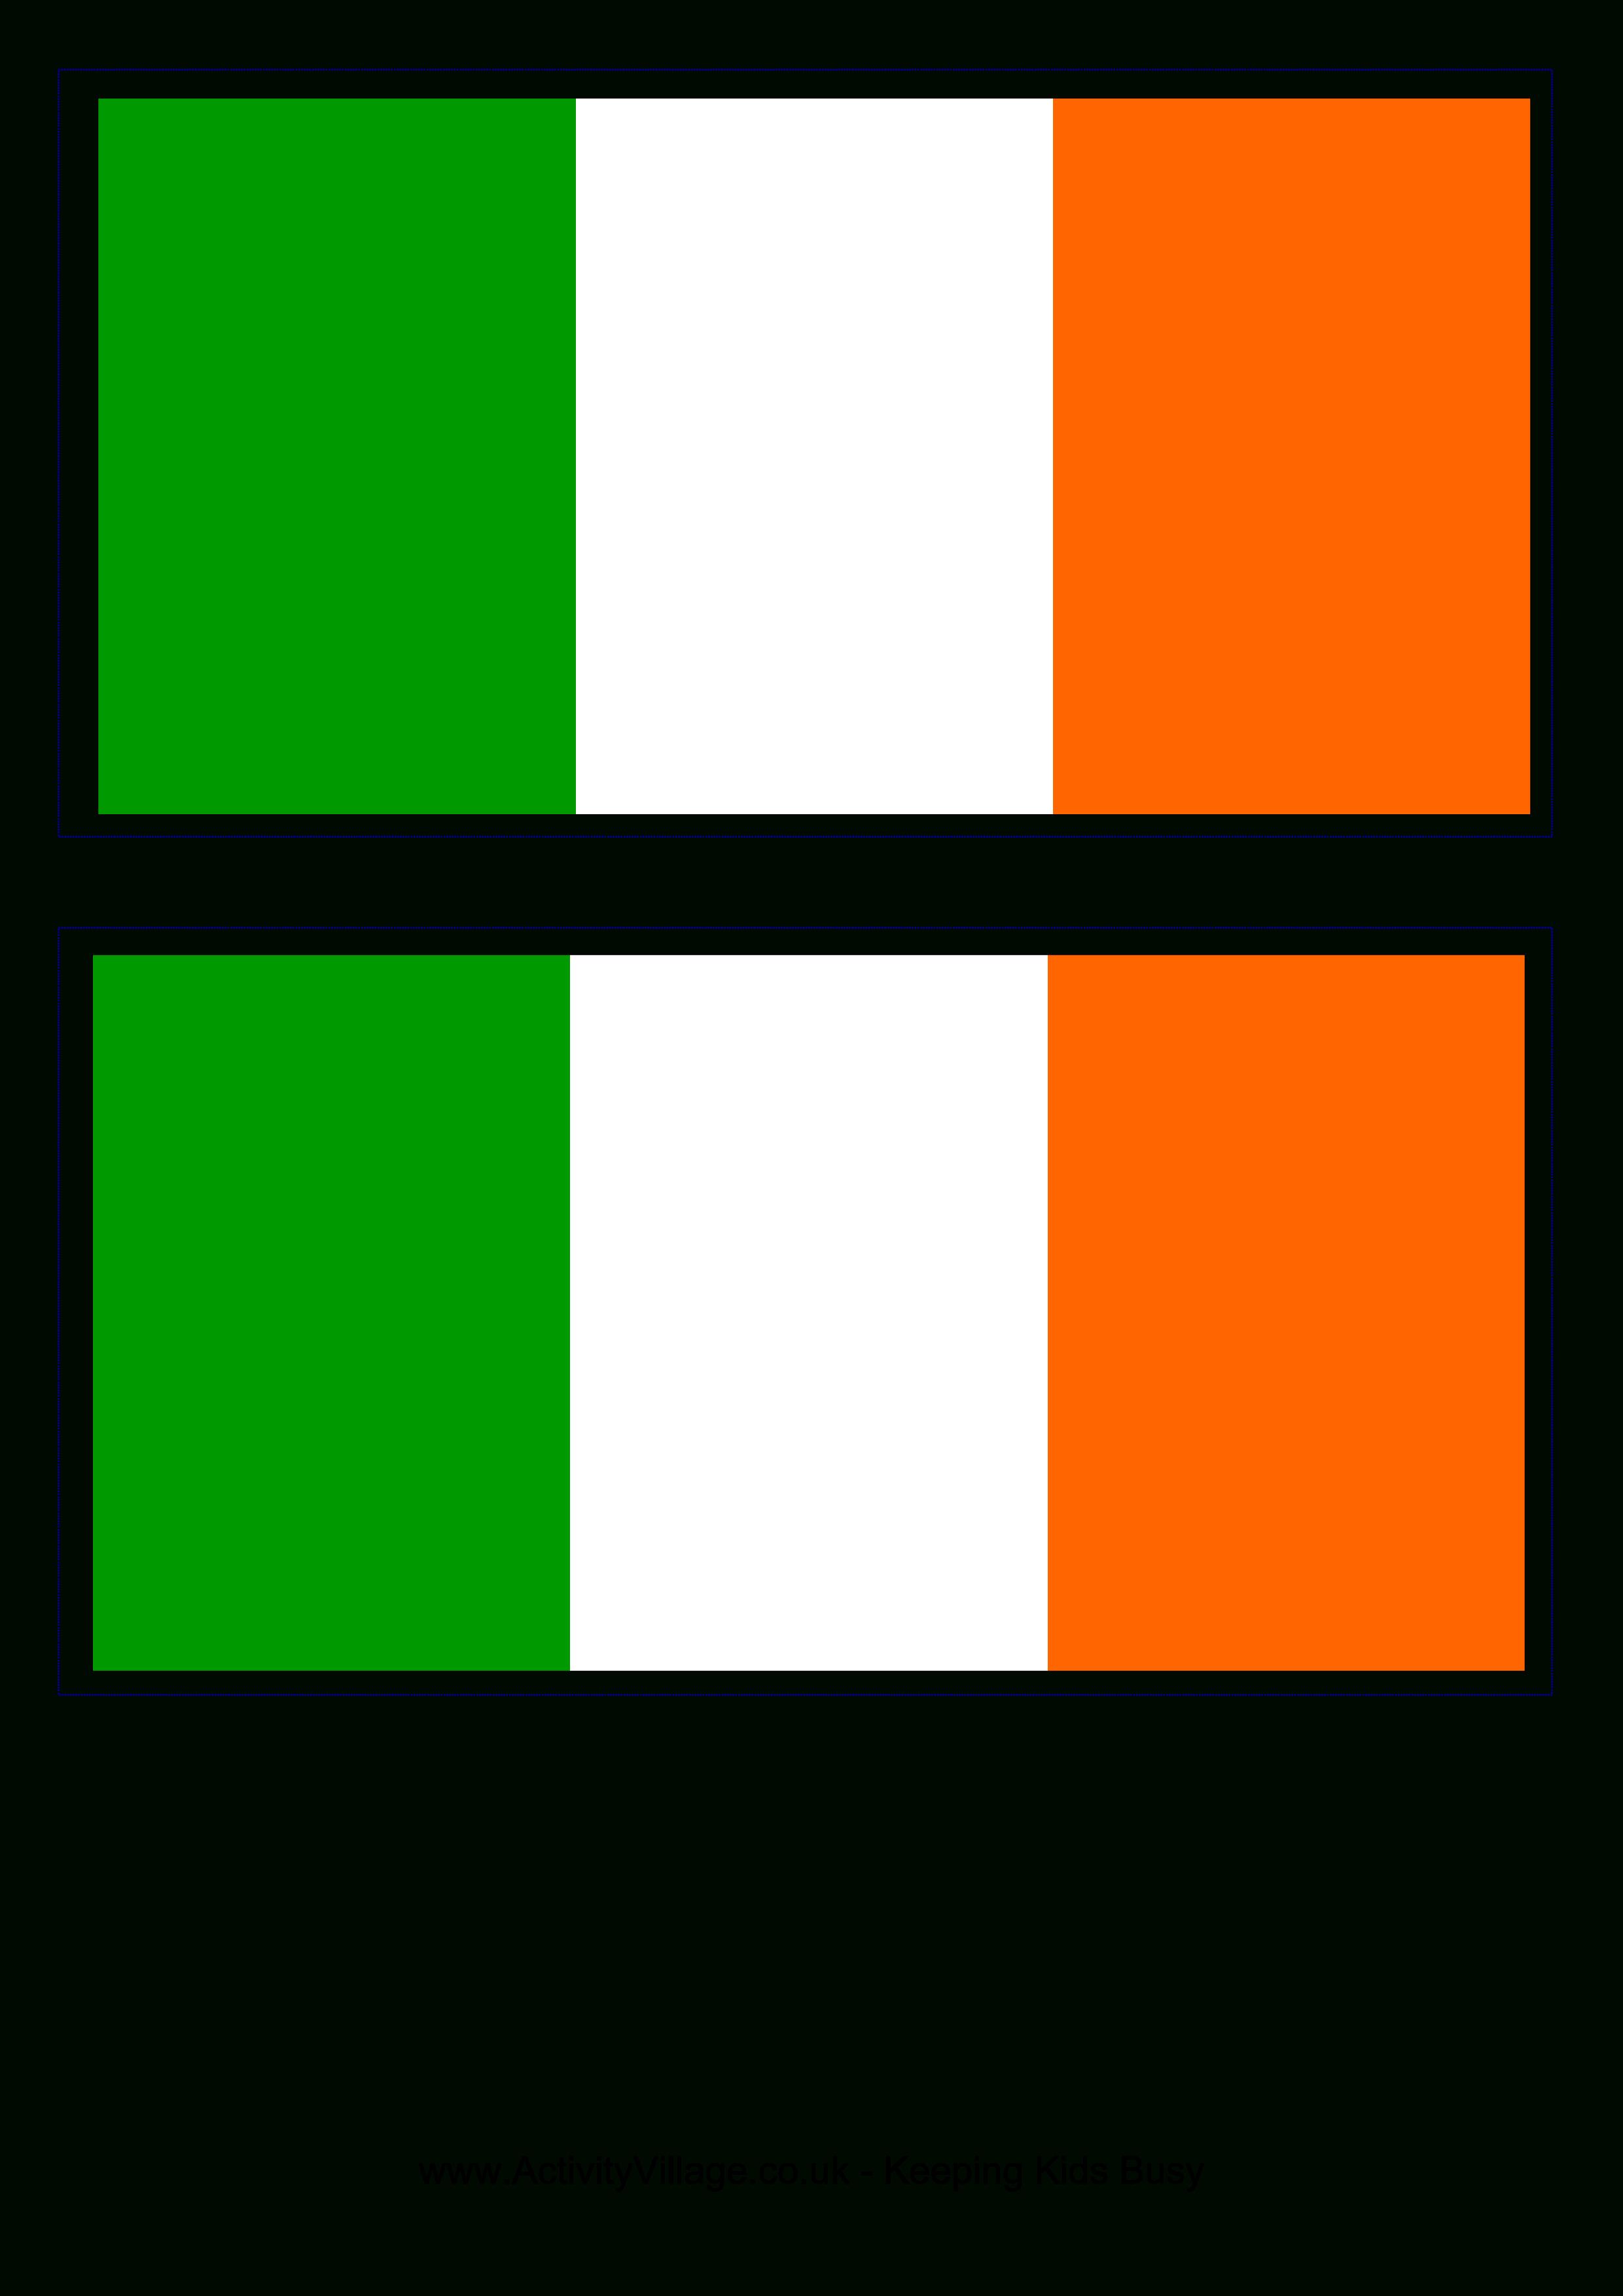 Irish Flag - Free Printable Irish Flag | When I'm Feelin Crafty - Free Printable Scottish Flag